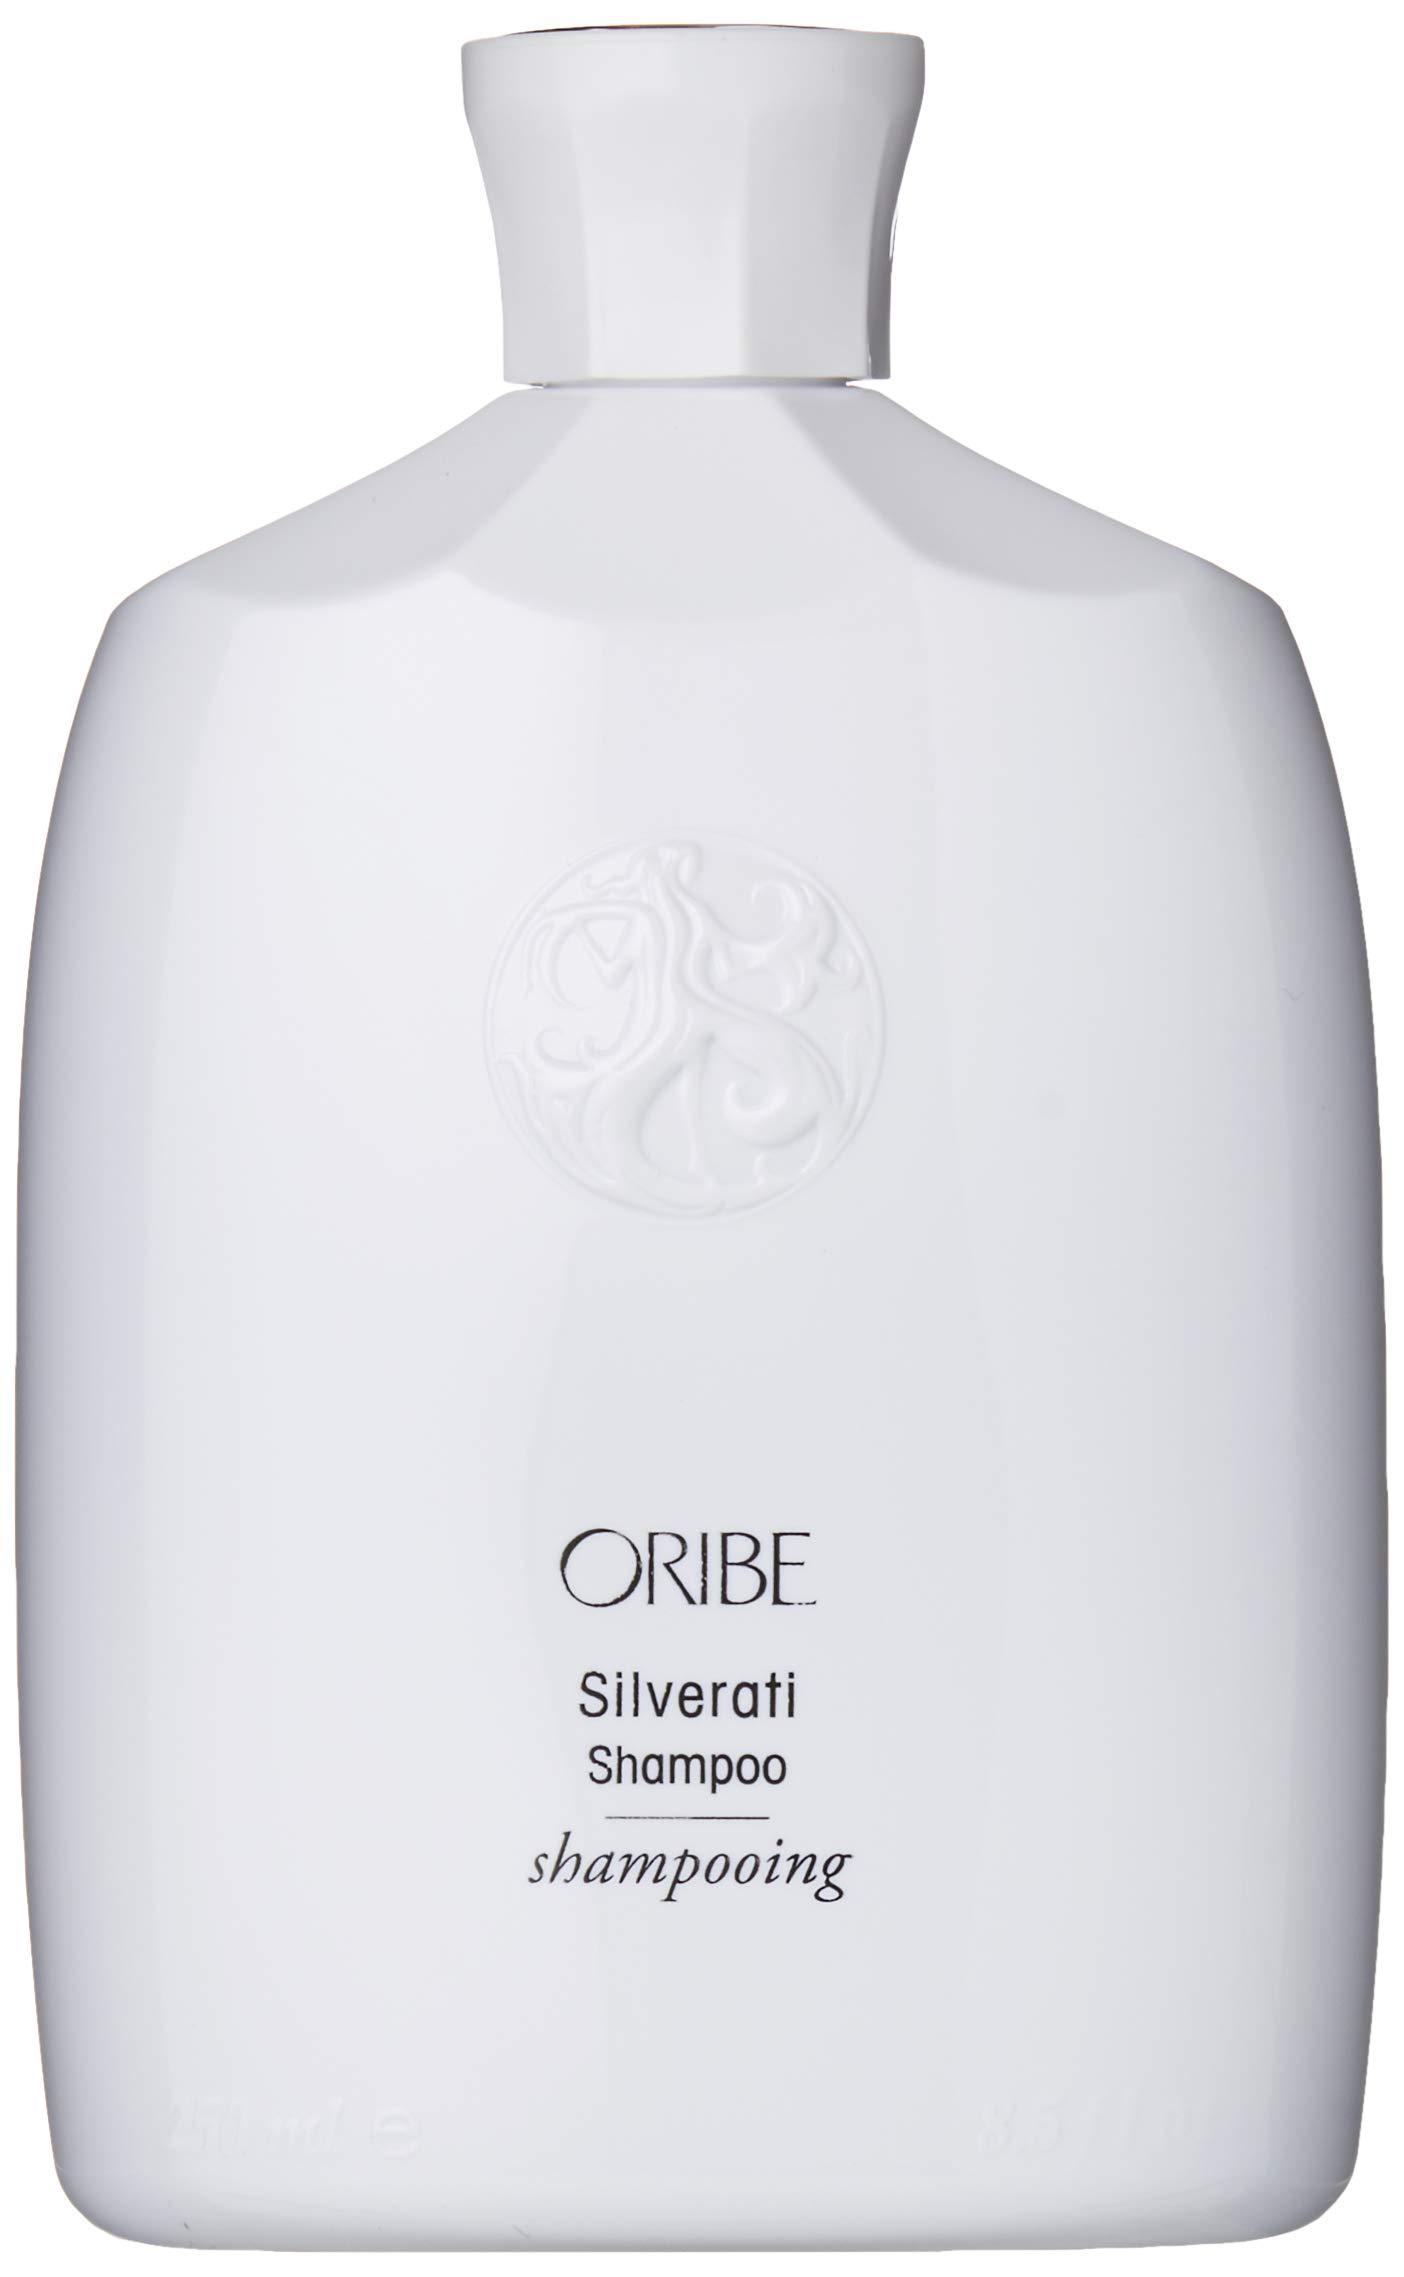 ORIBE Silverati Shampoo, 8.5 oz by ORIBE